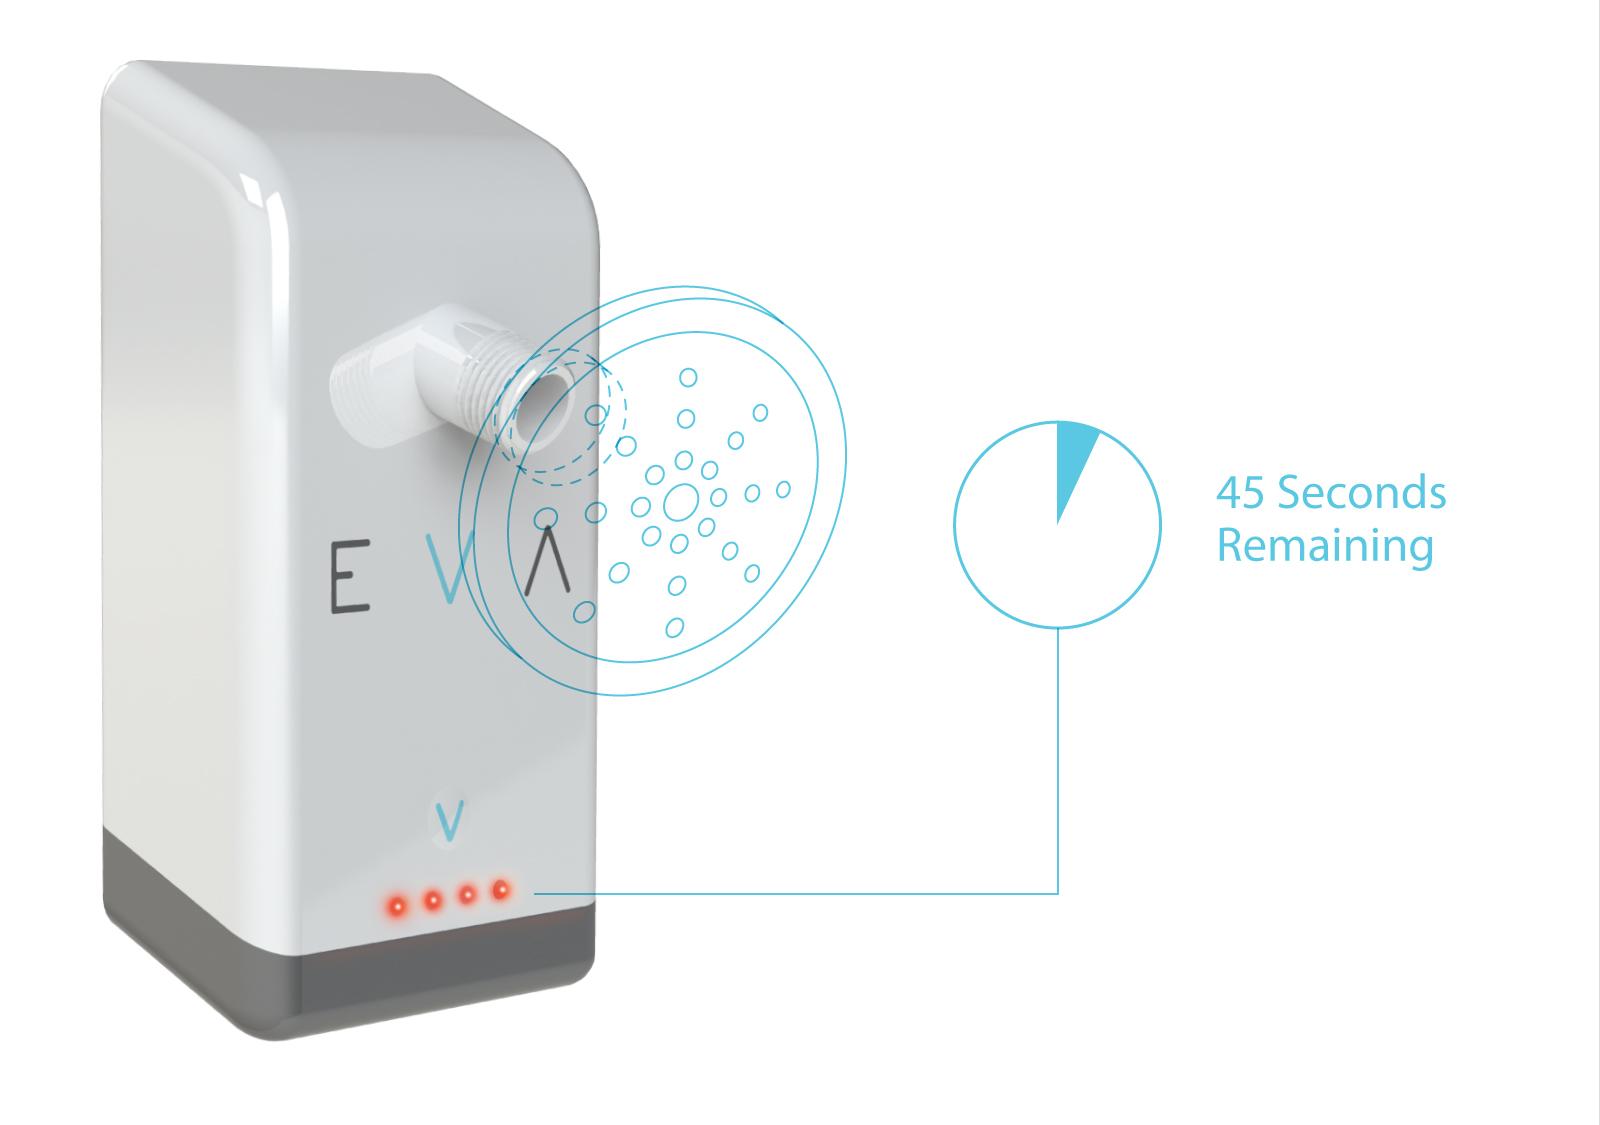 Eva Smart showerhead – Save Water